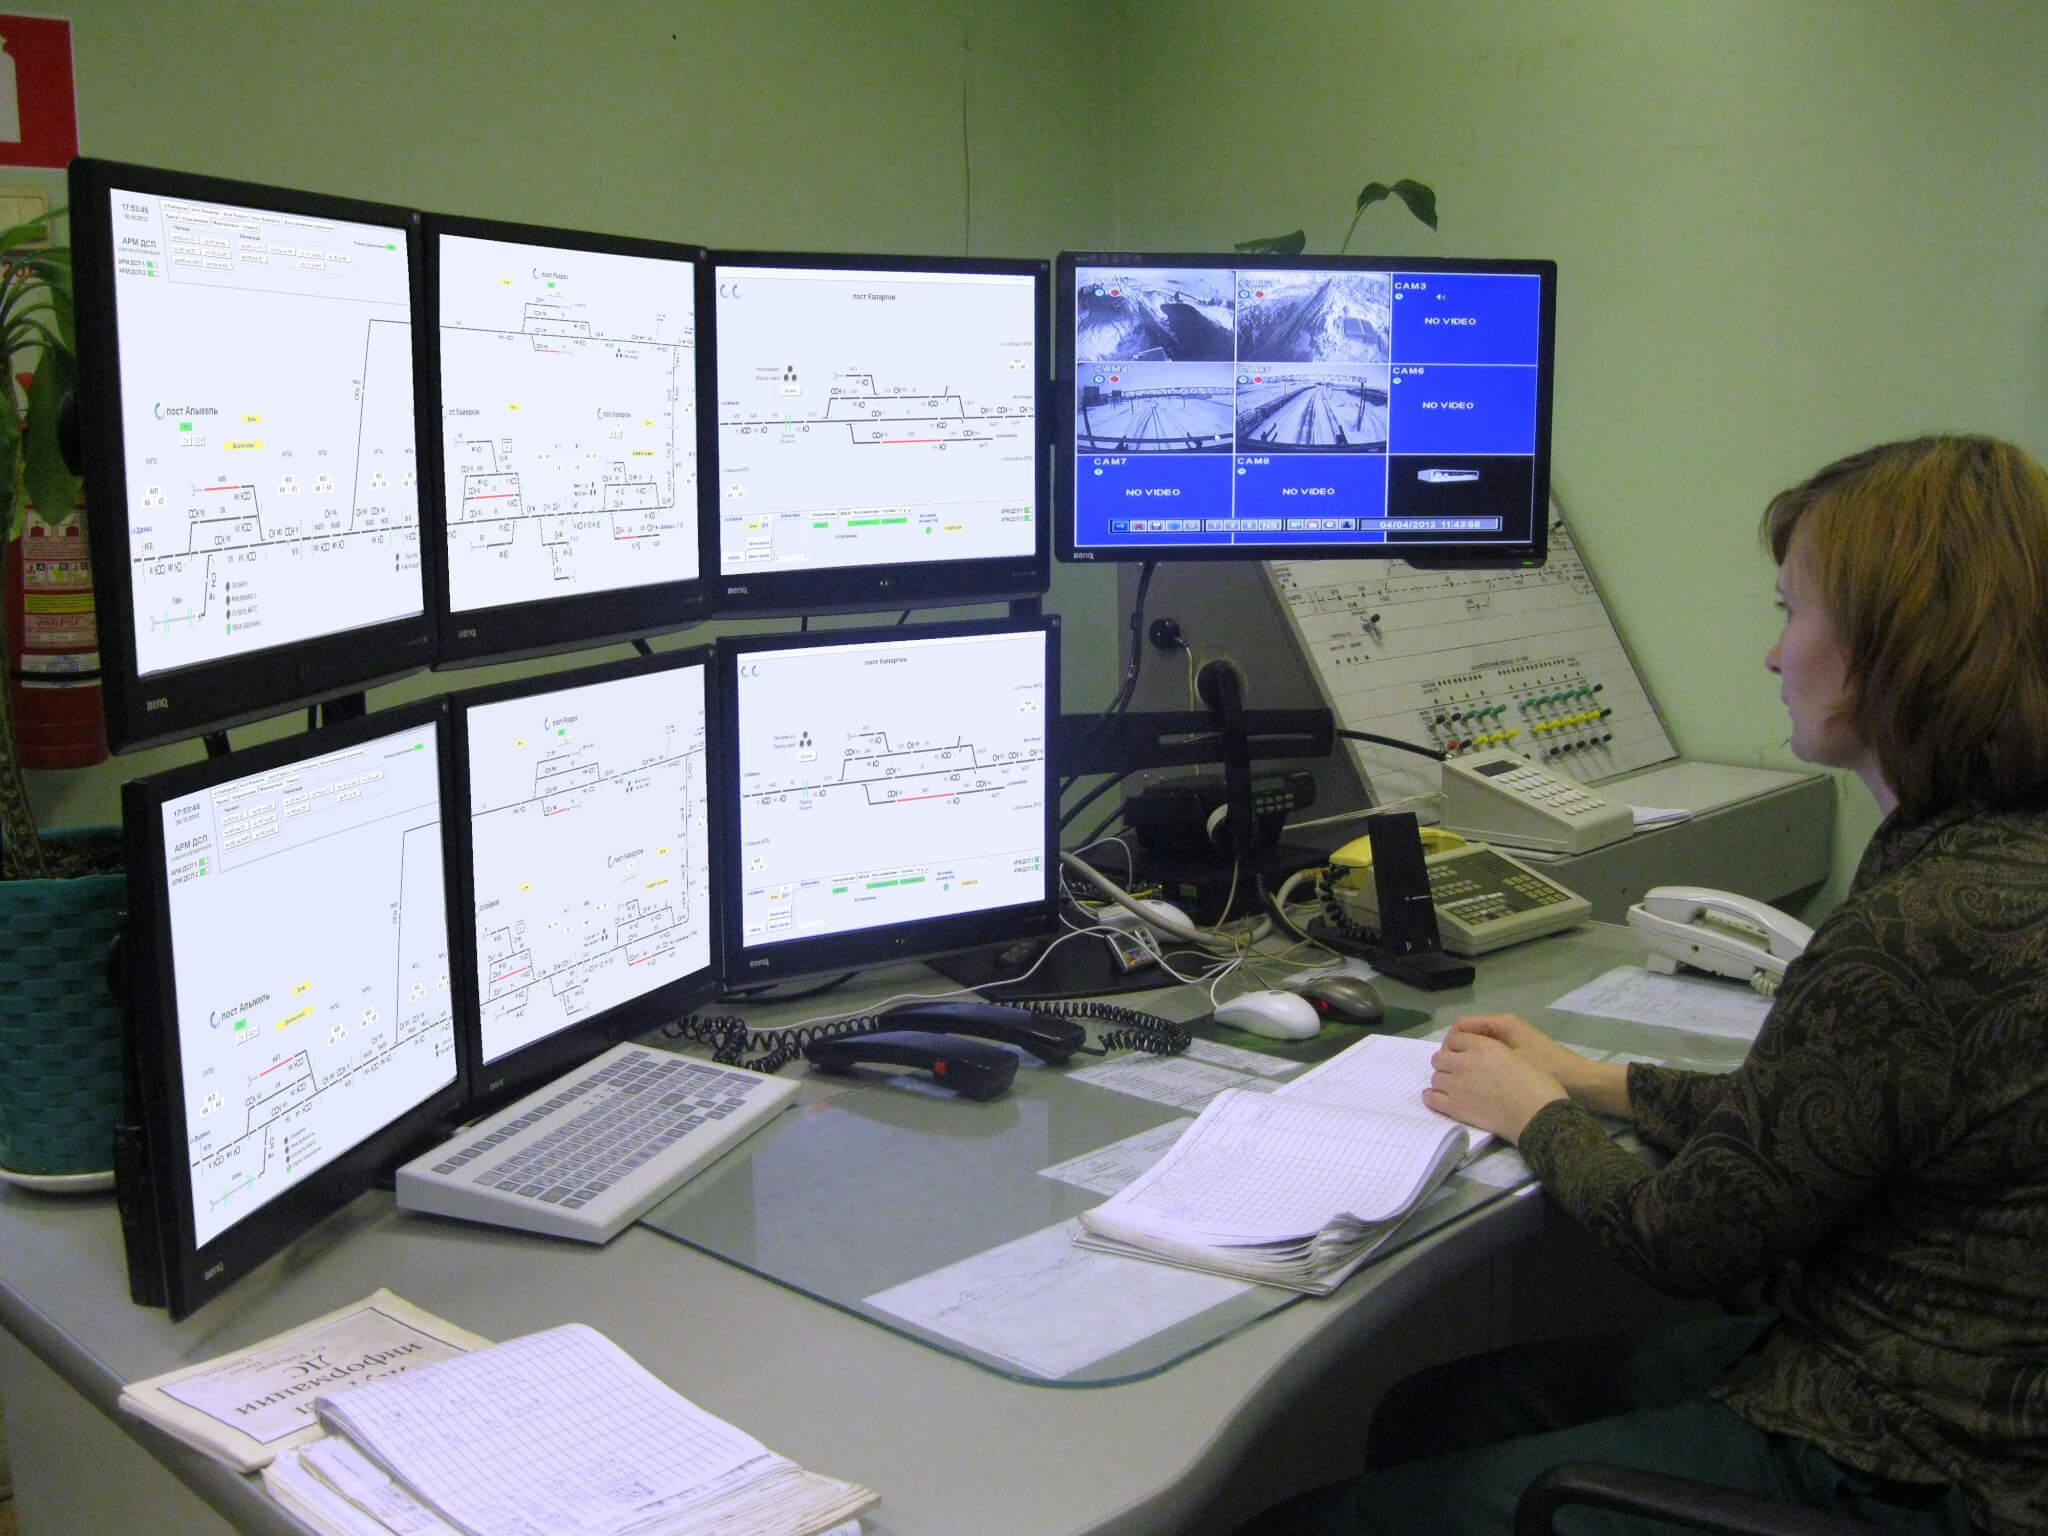 Station rail operator work terminal (MPC-I)